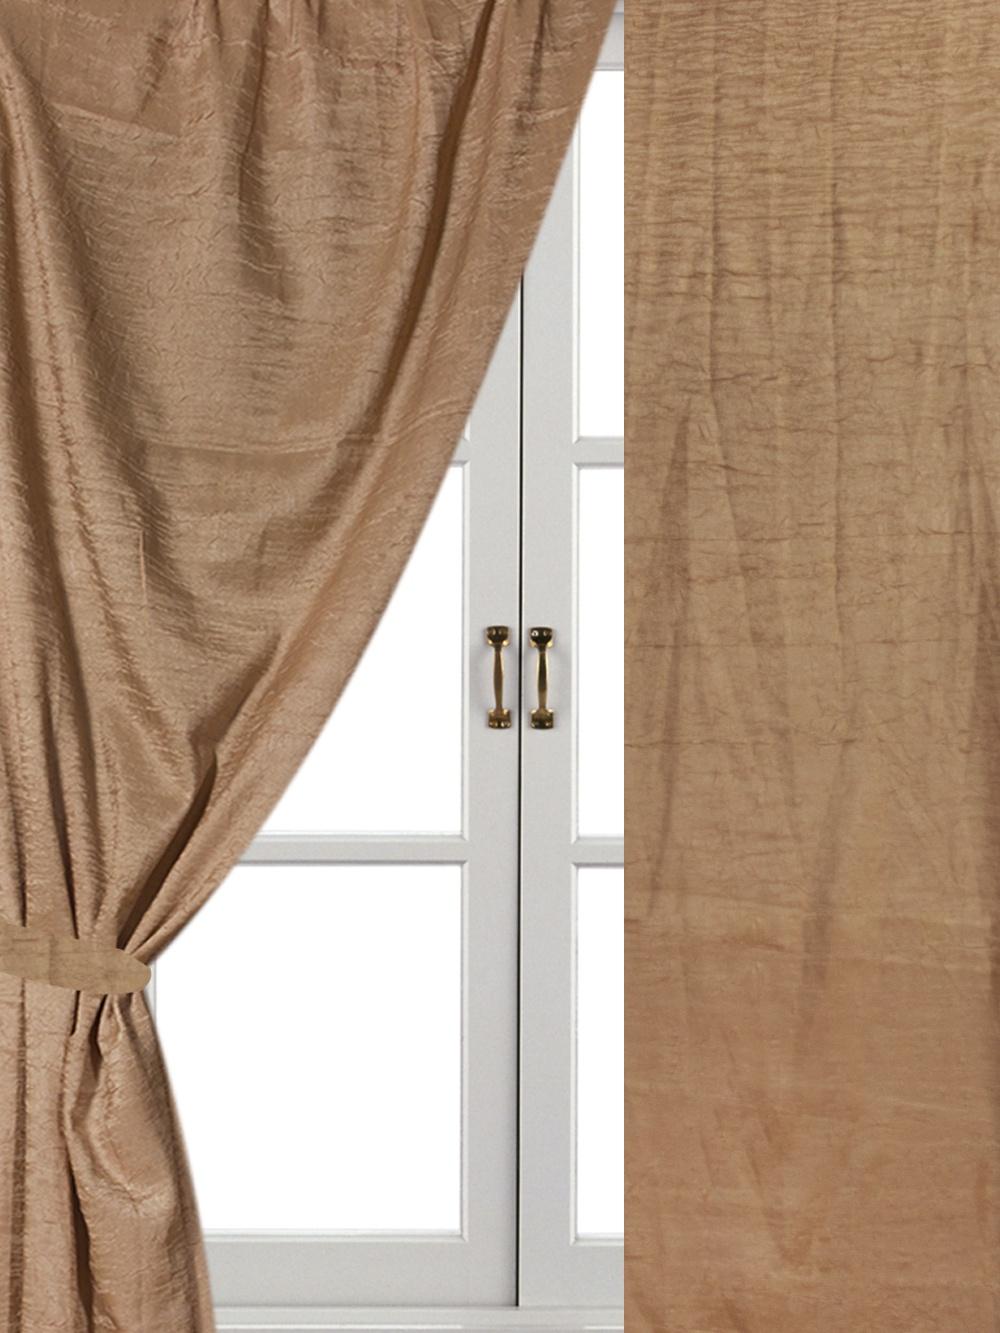 Комплект штор Айлант А34, бежевый шторы для комнаты tomdom комплект штор тризи бежевый